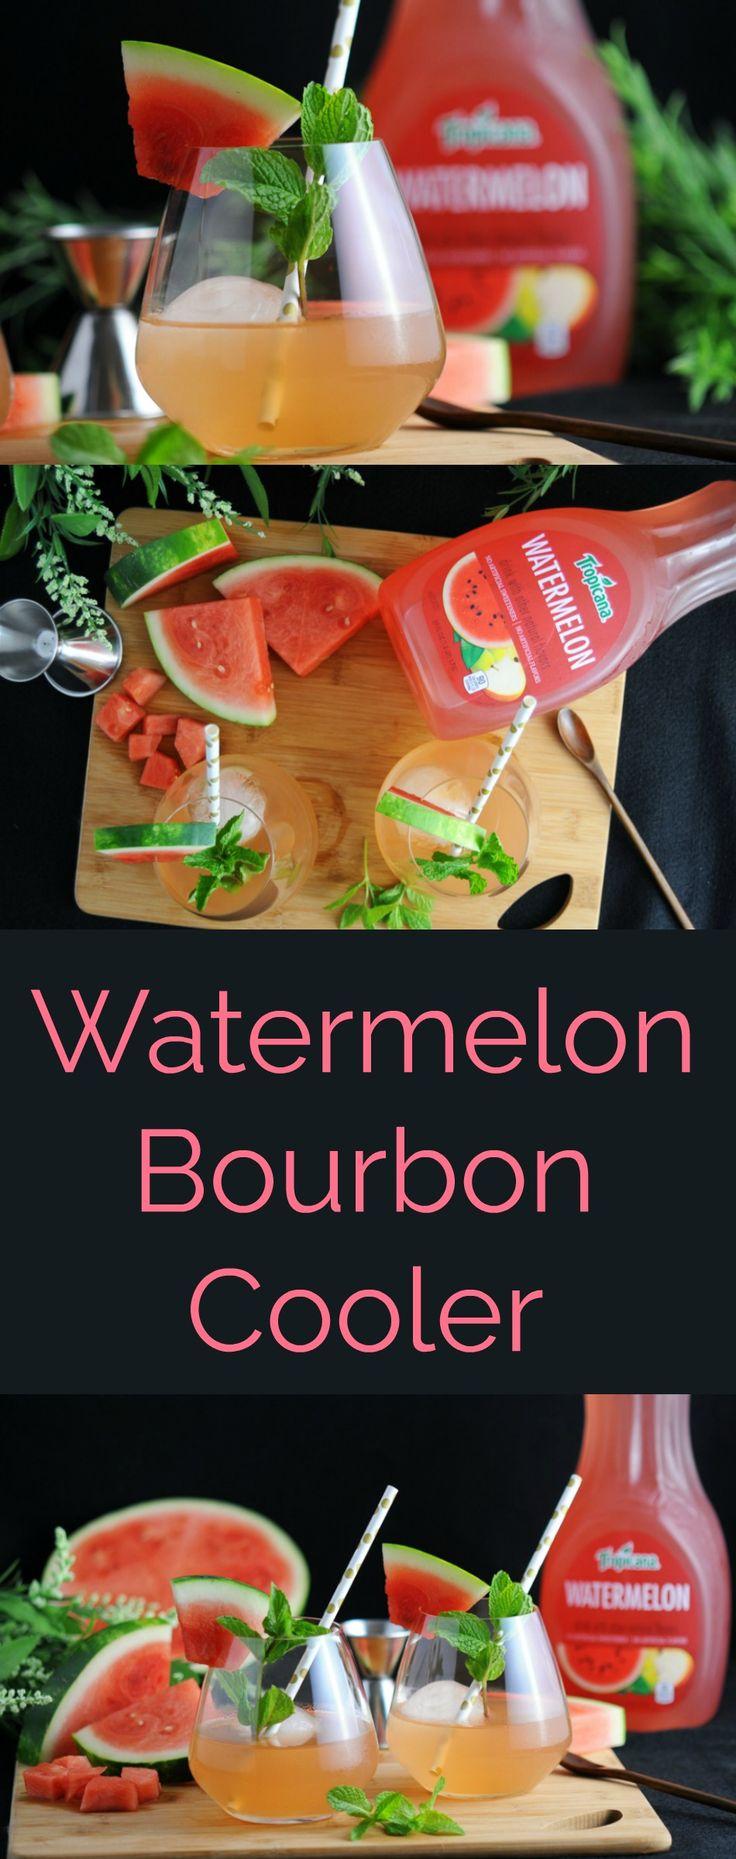 Watermelon Bourbon Coolers http://juicerblendercenter.com/centrifugal-juicers-for-fruits-and-vegetables/